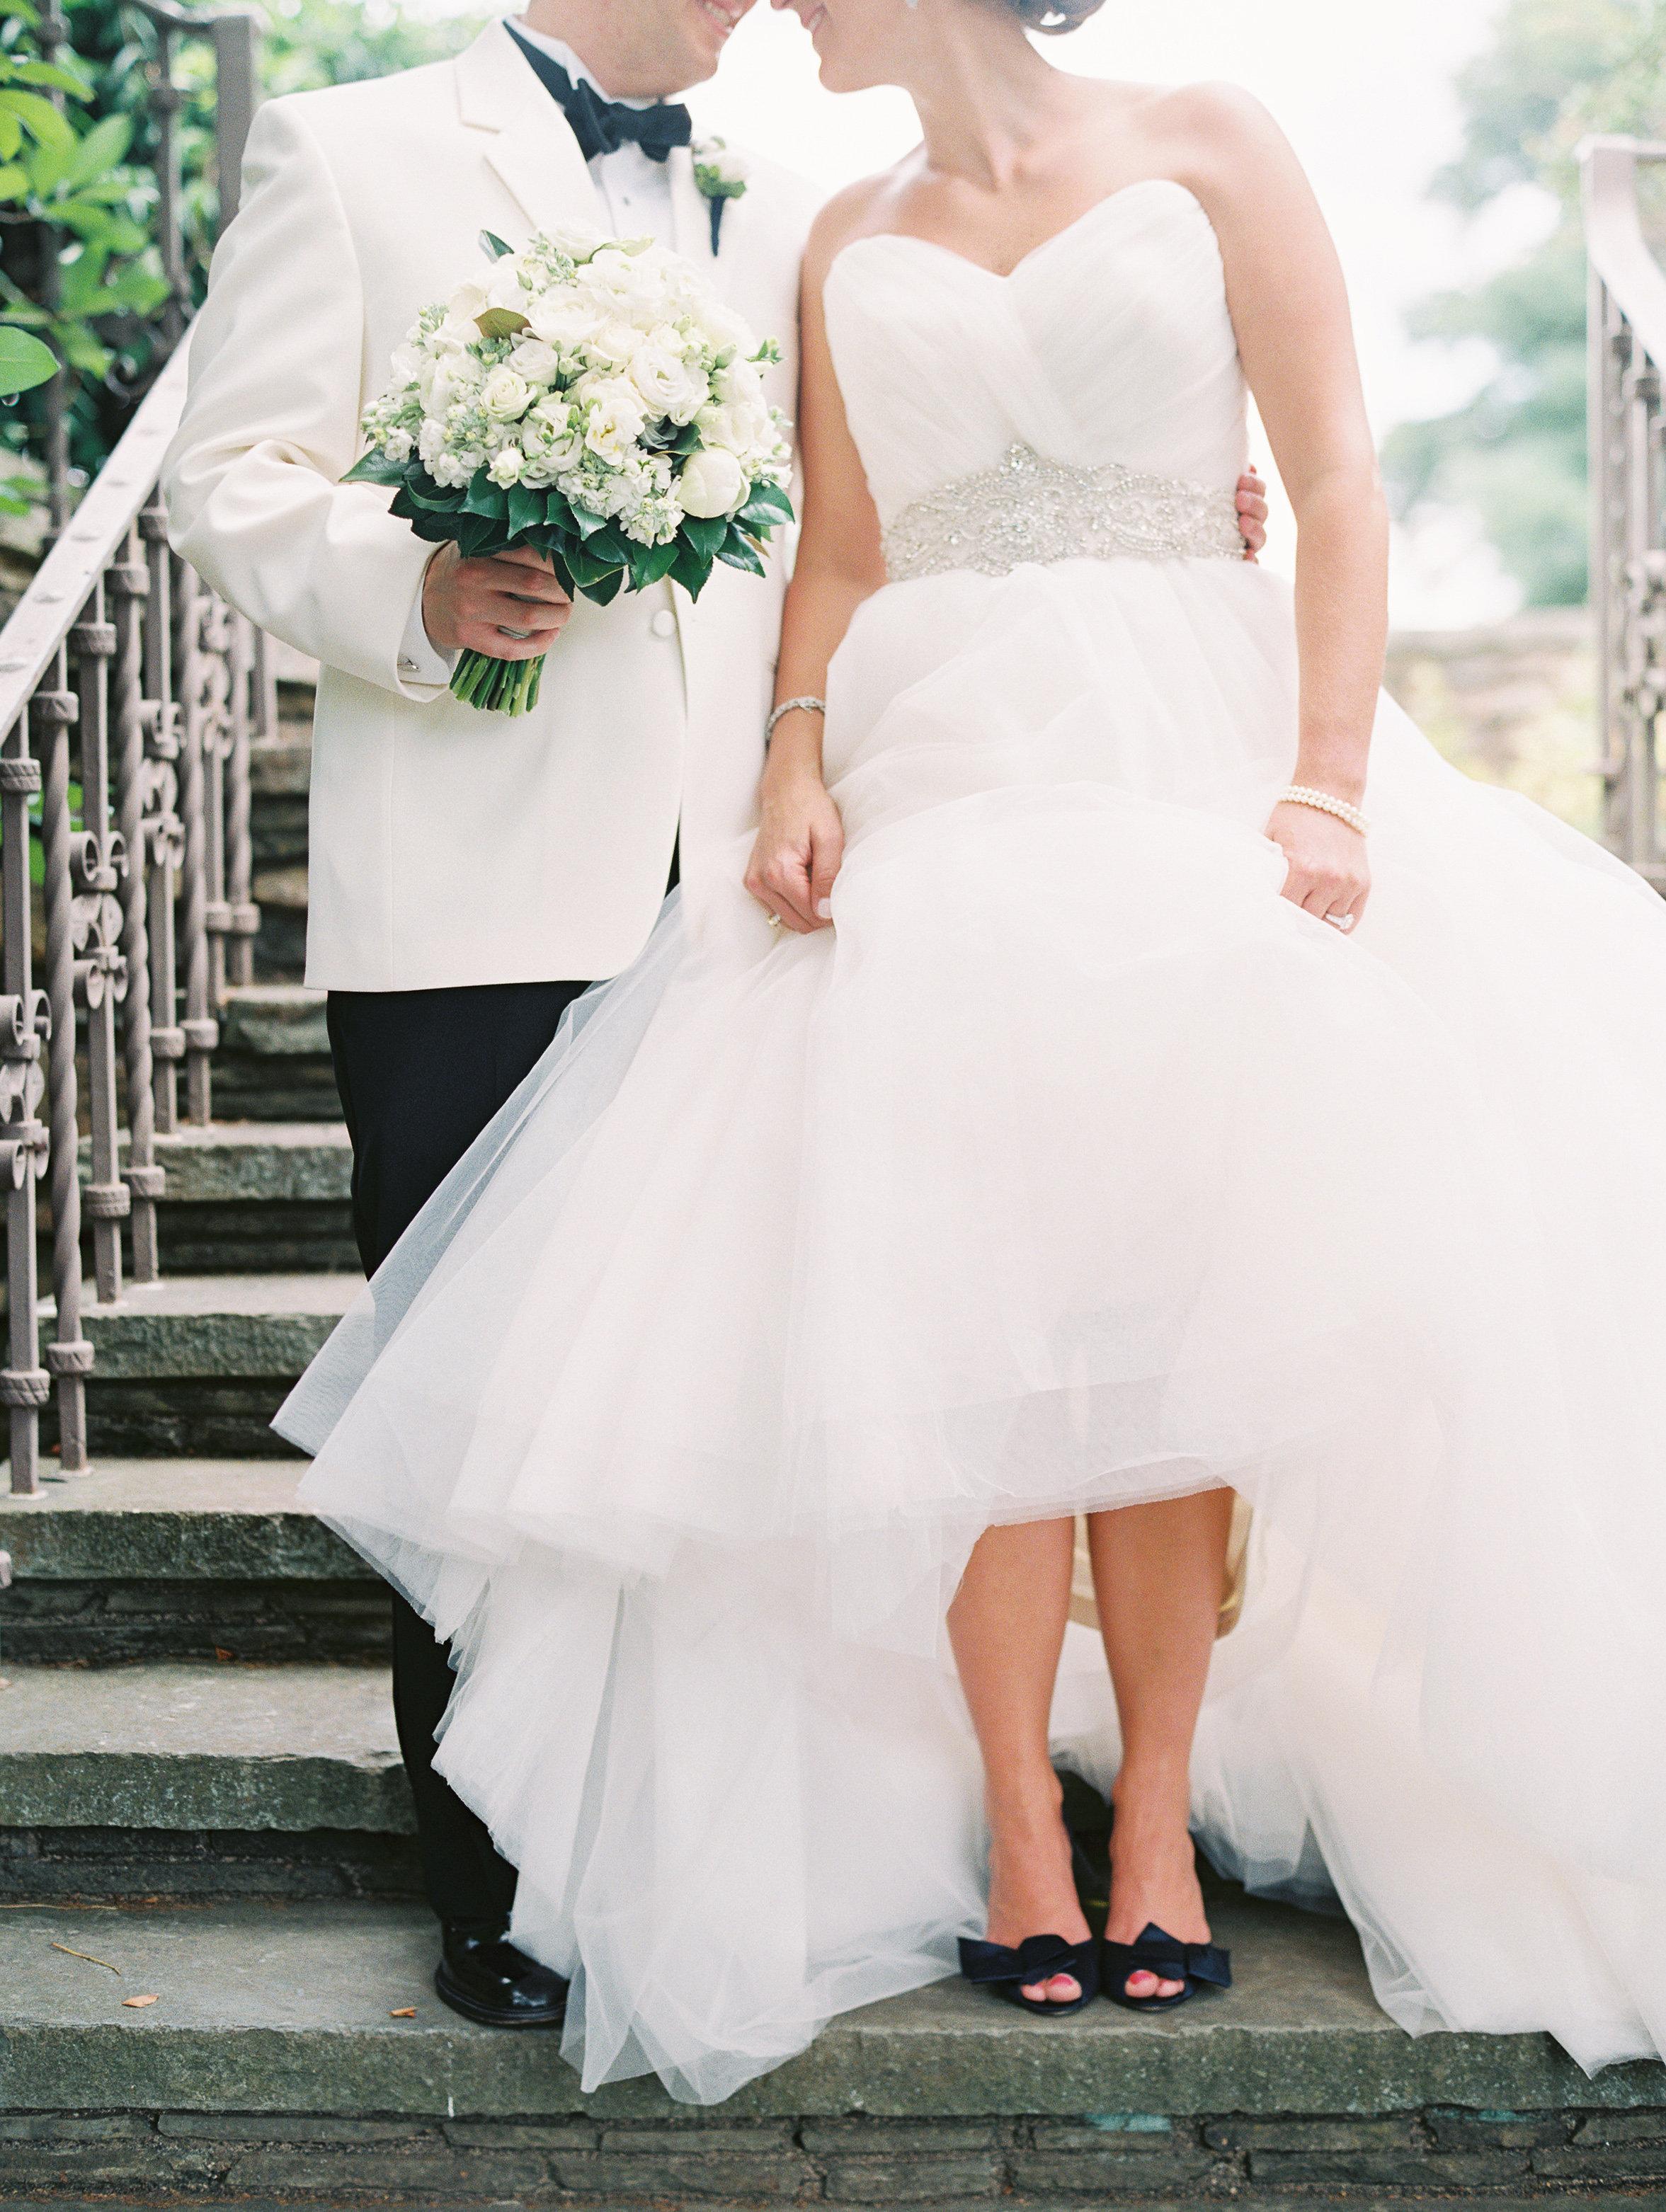 Caitlin&Davis-Bride&Groom-45.jpg